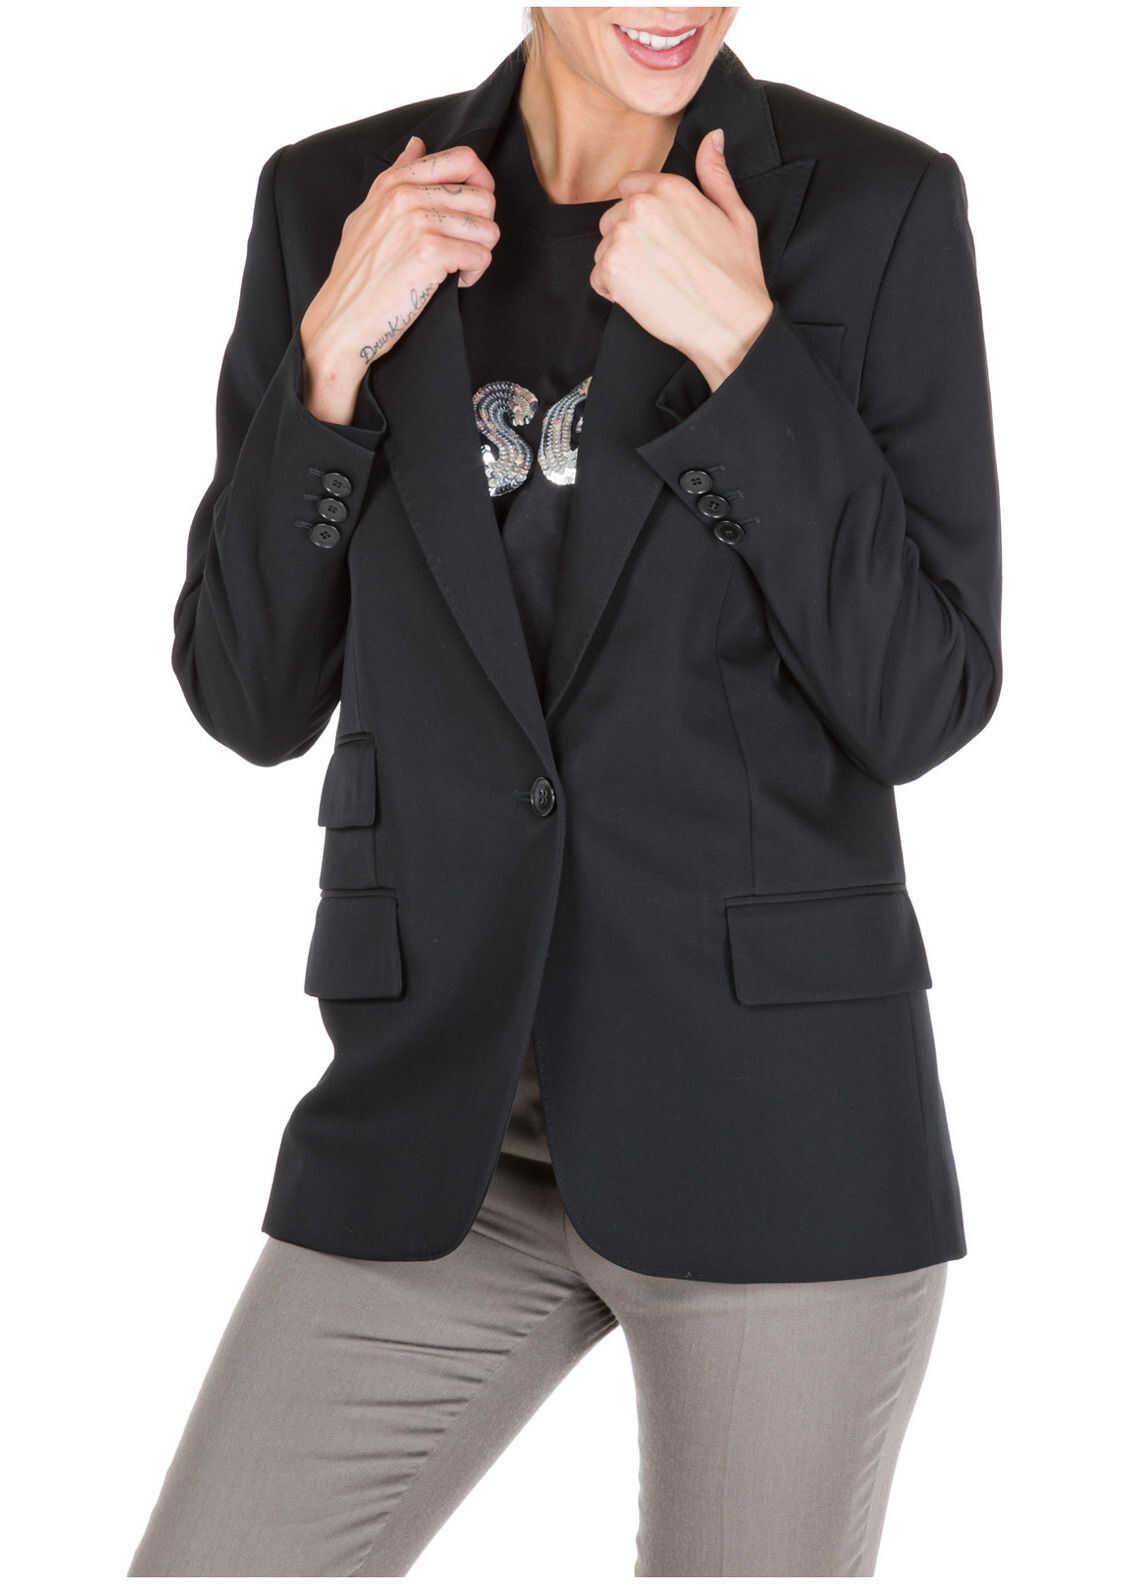 adidas by Stella McCartney Jacket Blazer Black